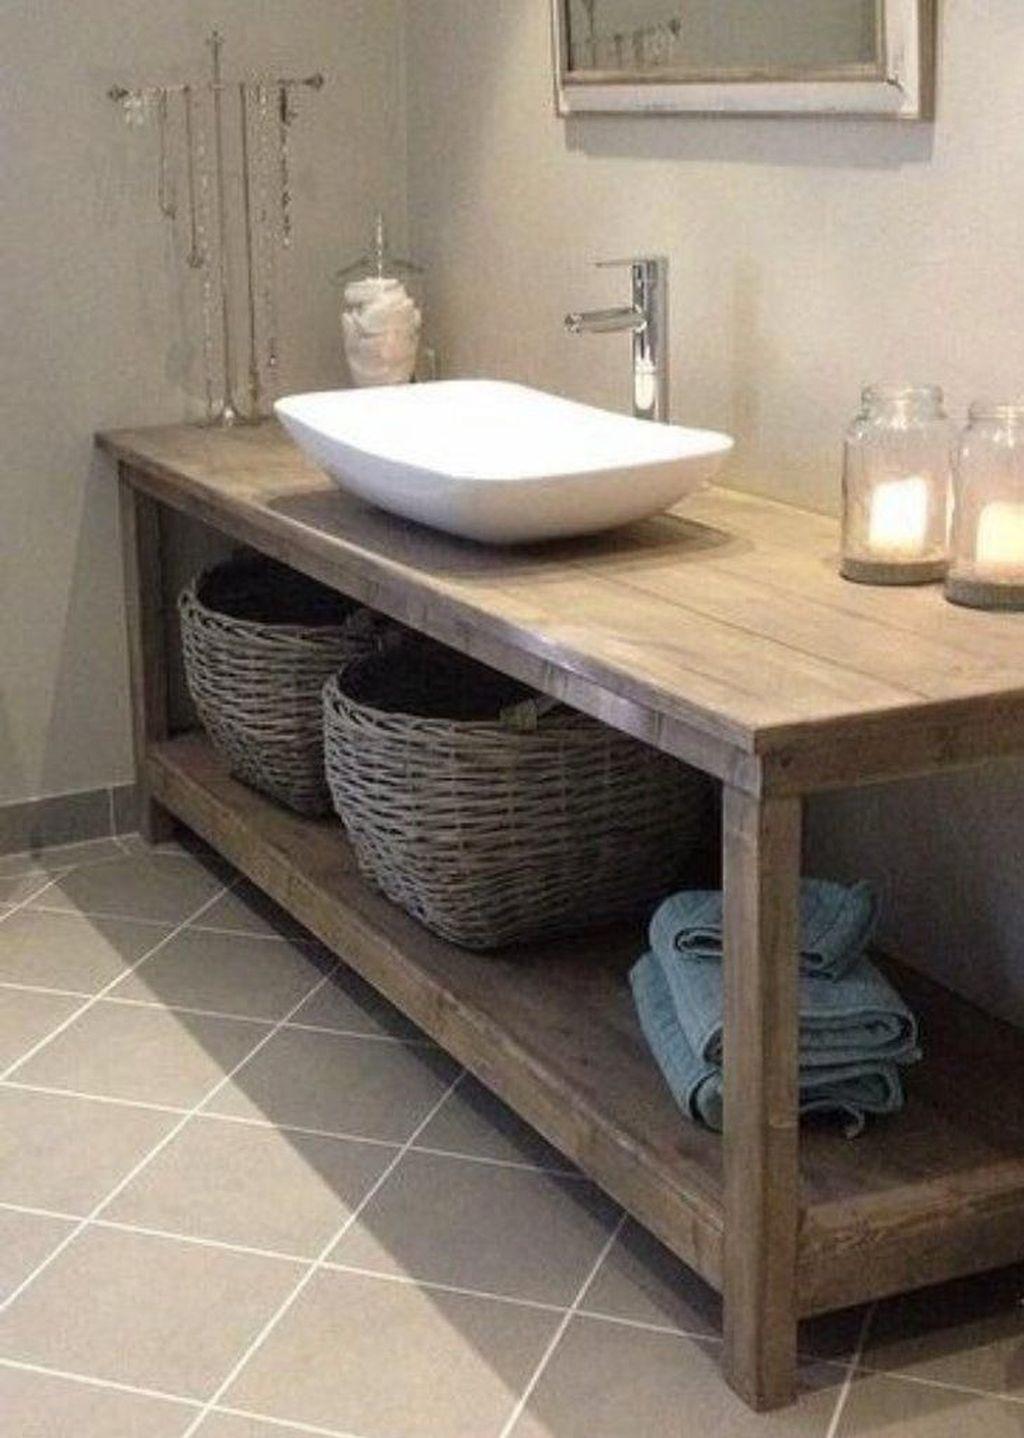 Fascinating Rustic Bathroom Decor Ideas You Must Copy 18